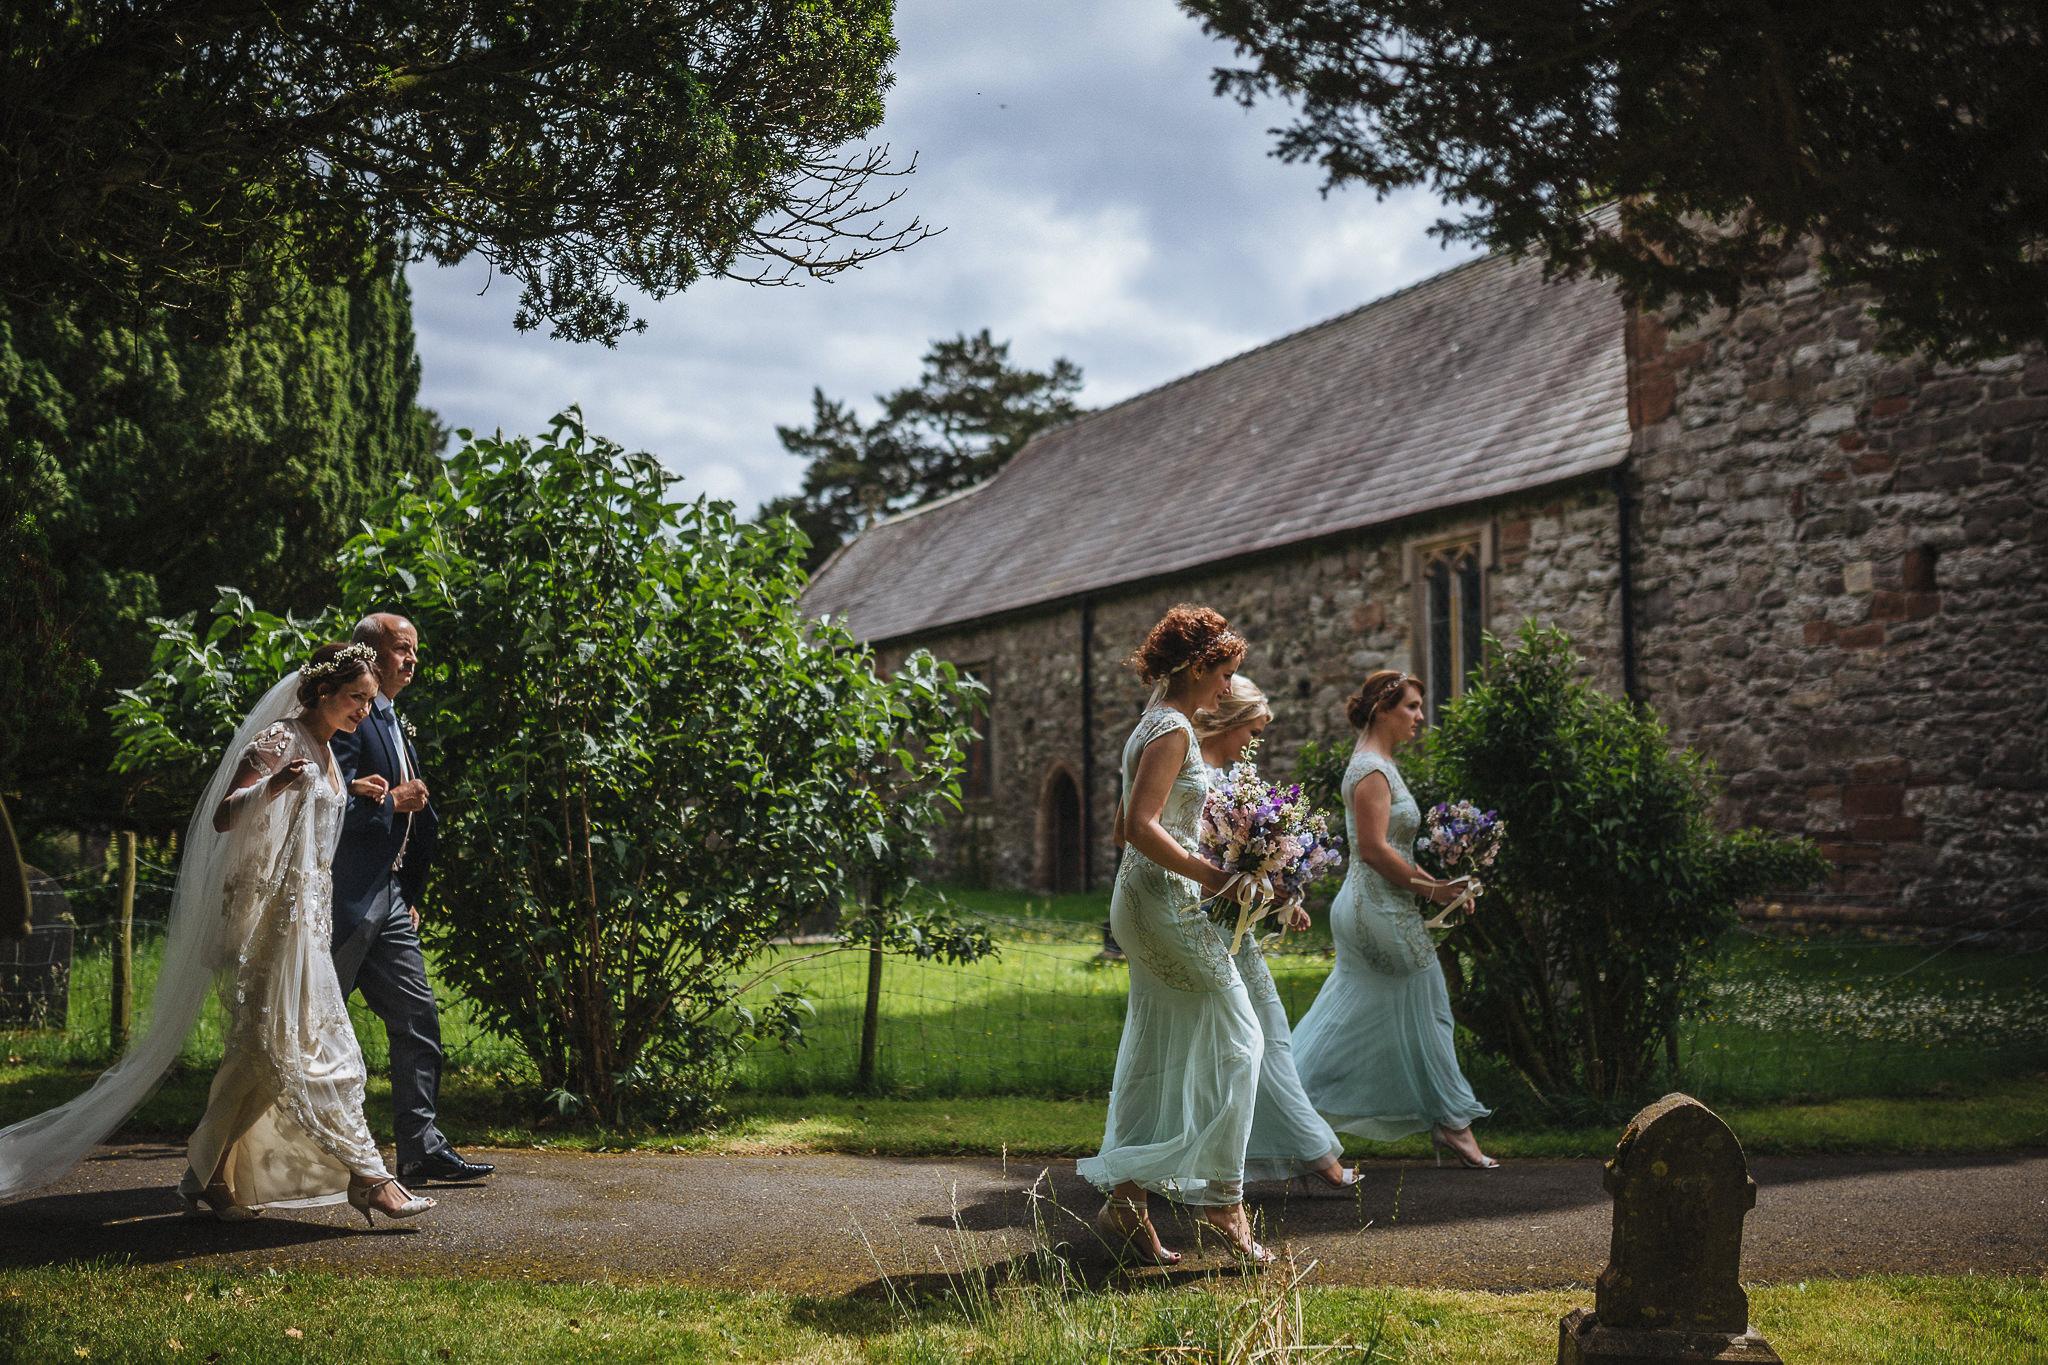 paul-marbrook-Farm-Wedding-Photographer-Lancashire-90024